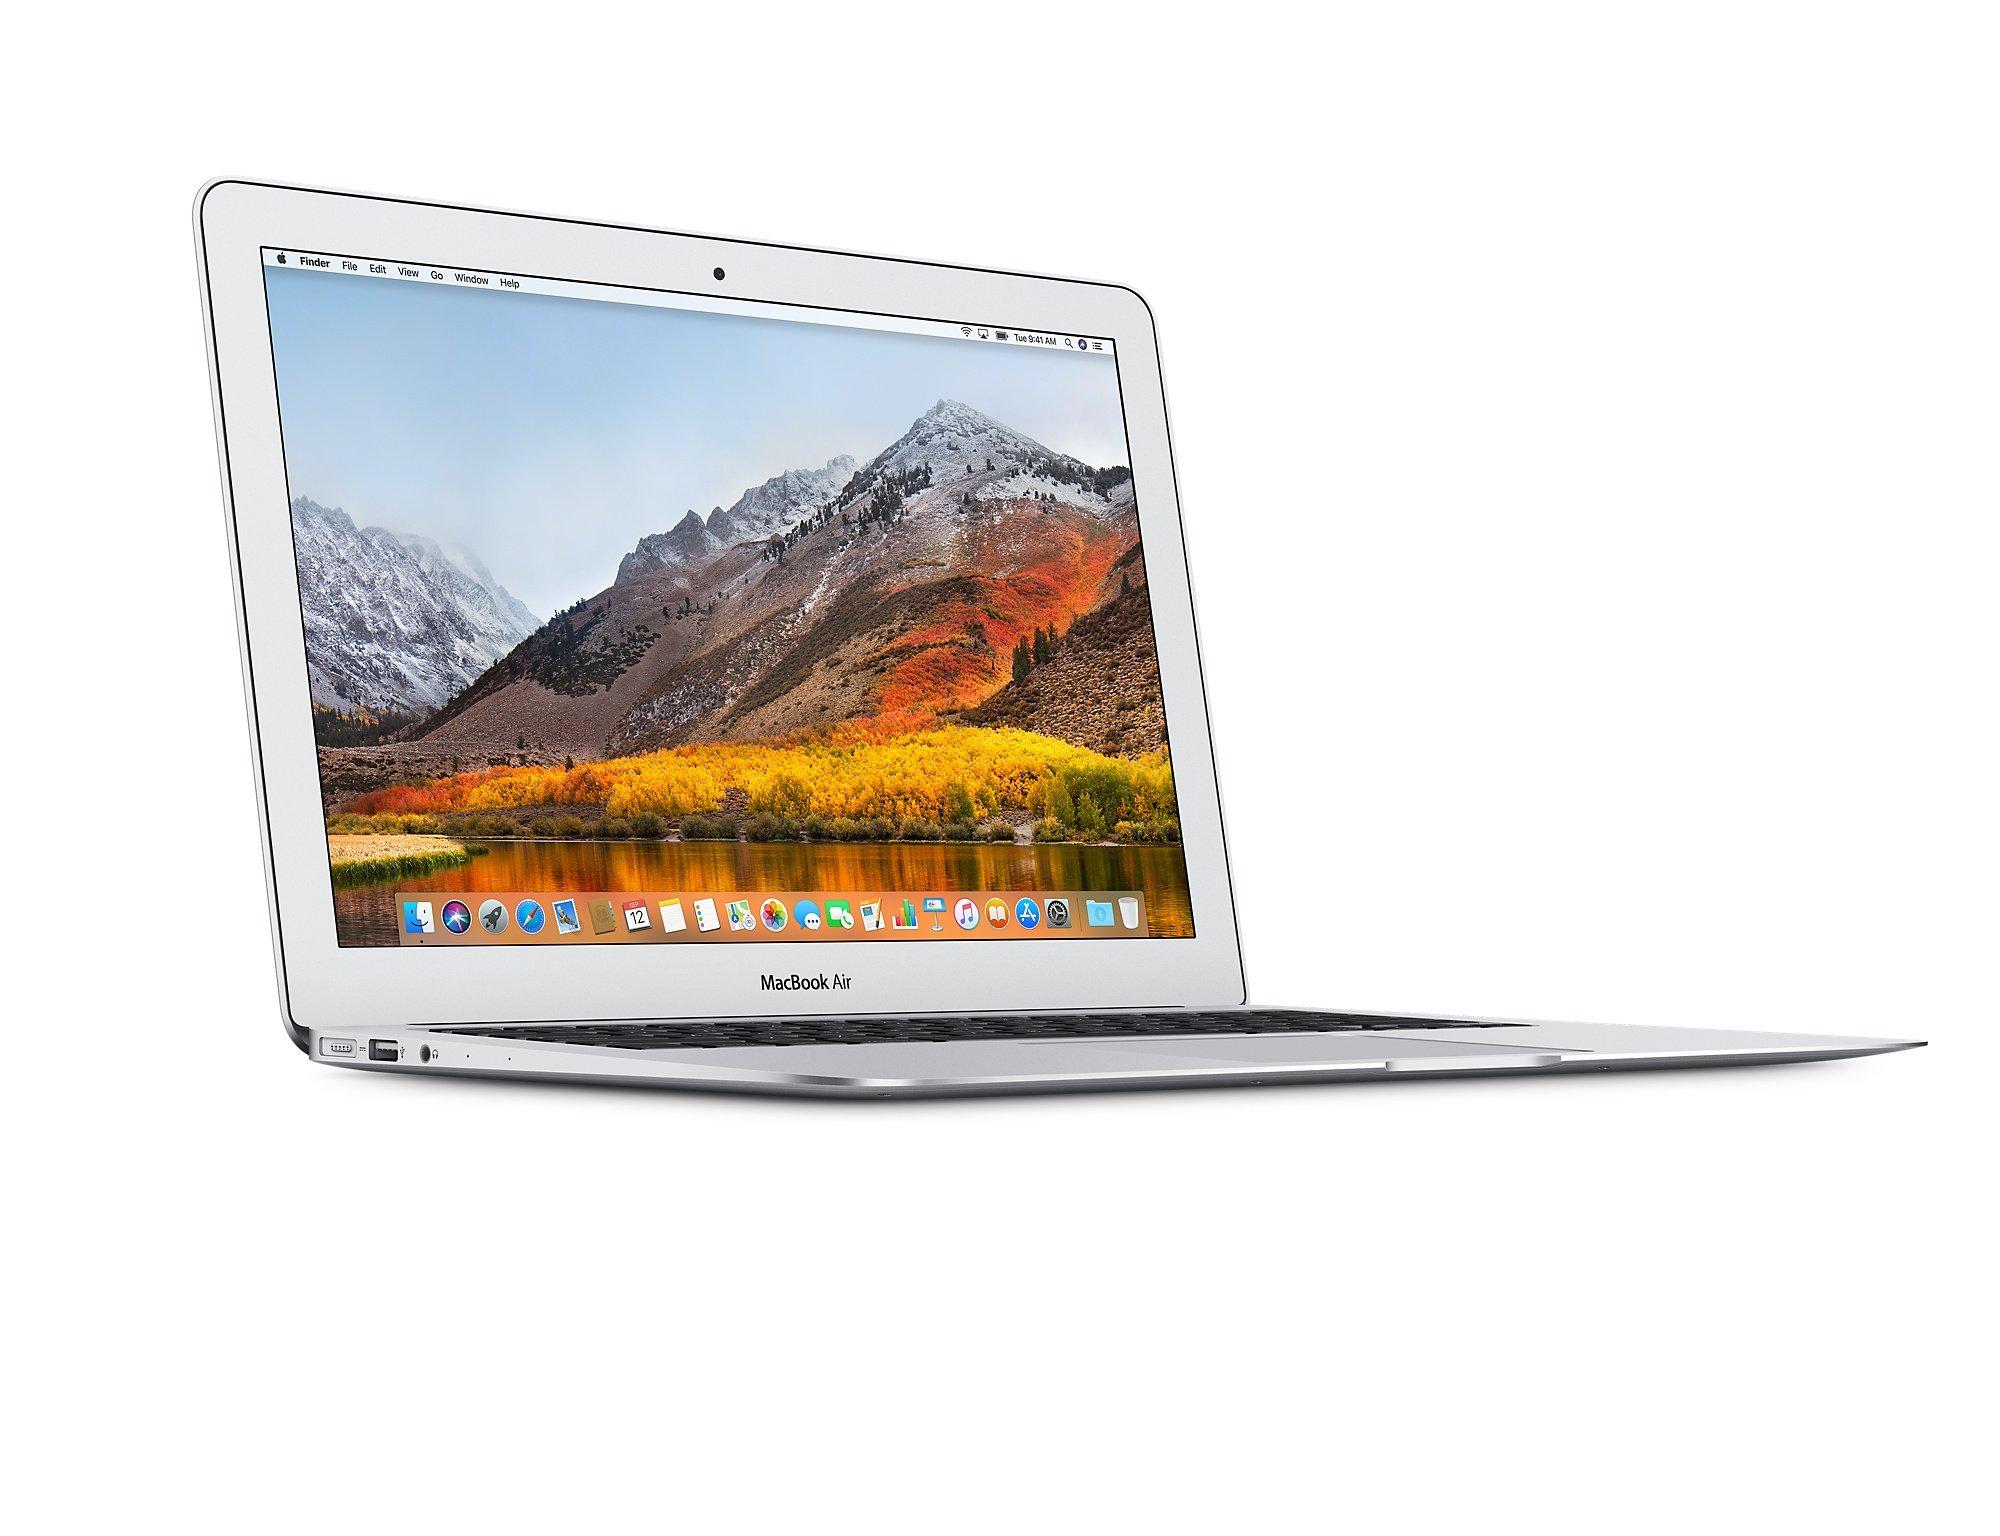 مواصفات ماك بوك إير MacBook Air الجديد 2018 1